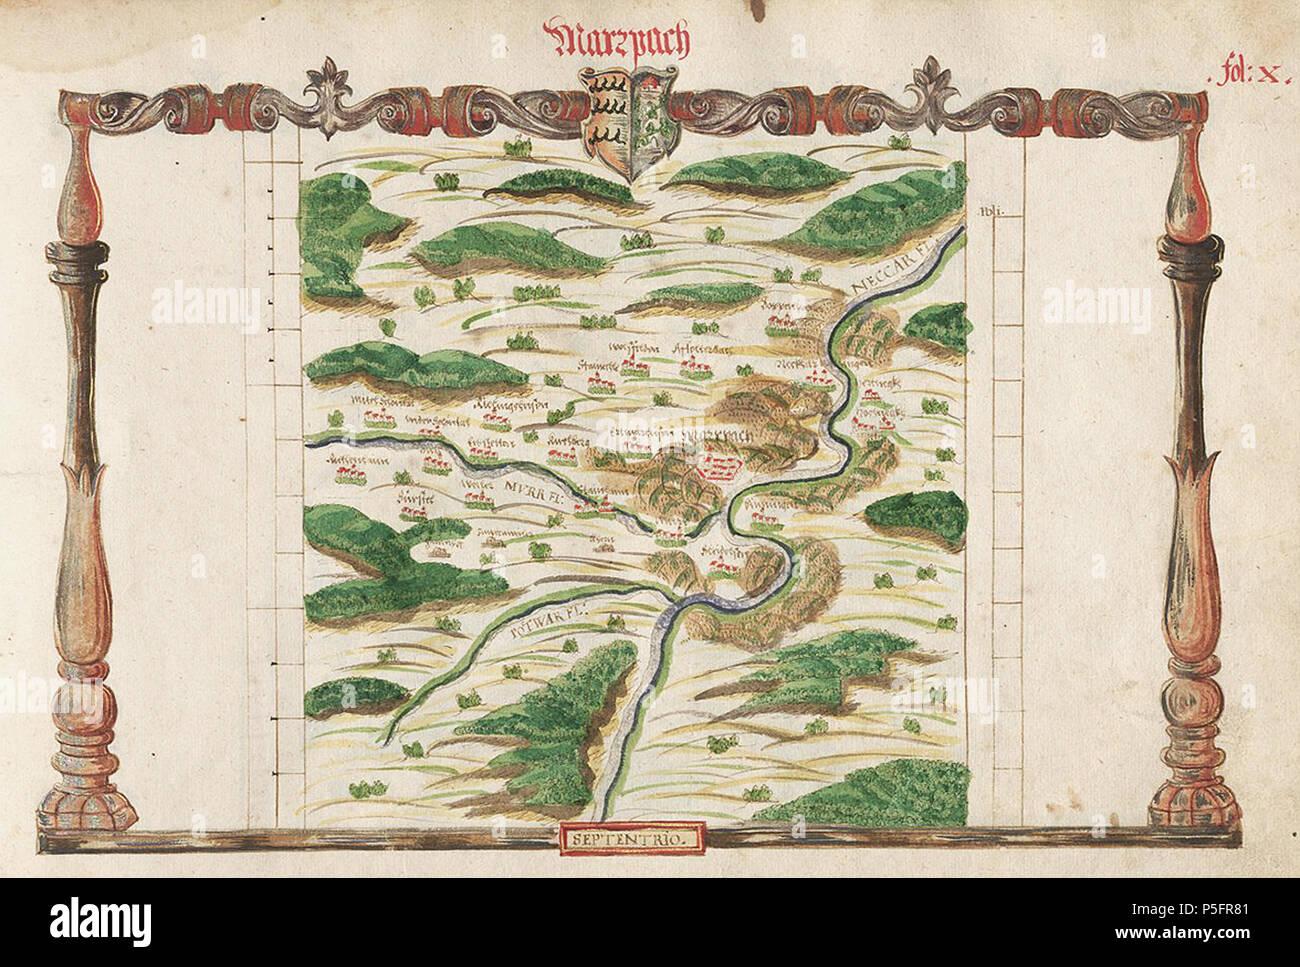 N/A. Deutsch: Amt Marbach im Atlas des Herzogtums Württemberg (1575), fol. X - Cod.hist.qt.102; Blatt 35, von Heinrich Schweickher . 1575. Heinrich Schweickher 17 1575 H Schweickher Marbach WLB 035W - Stock Image